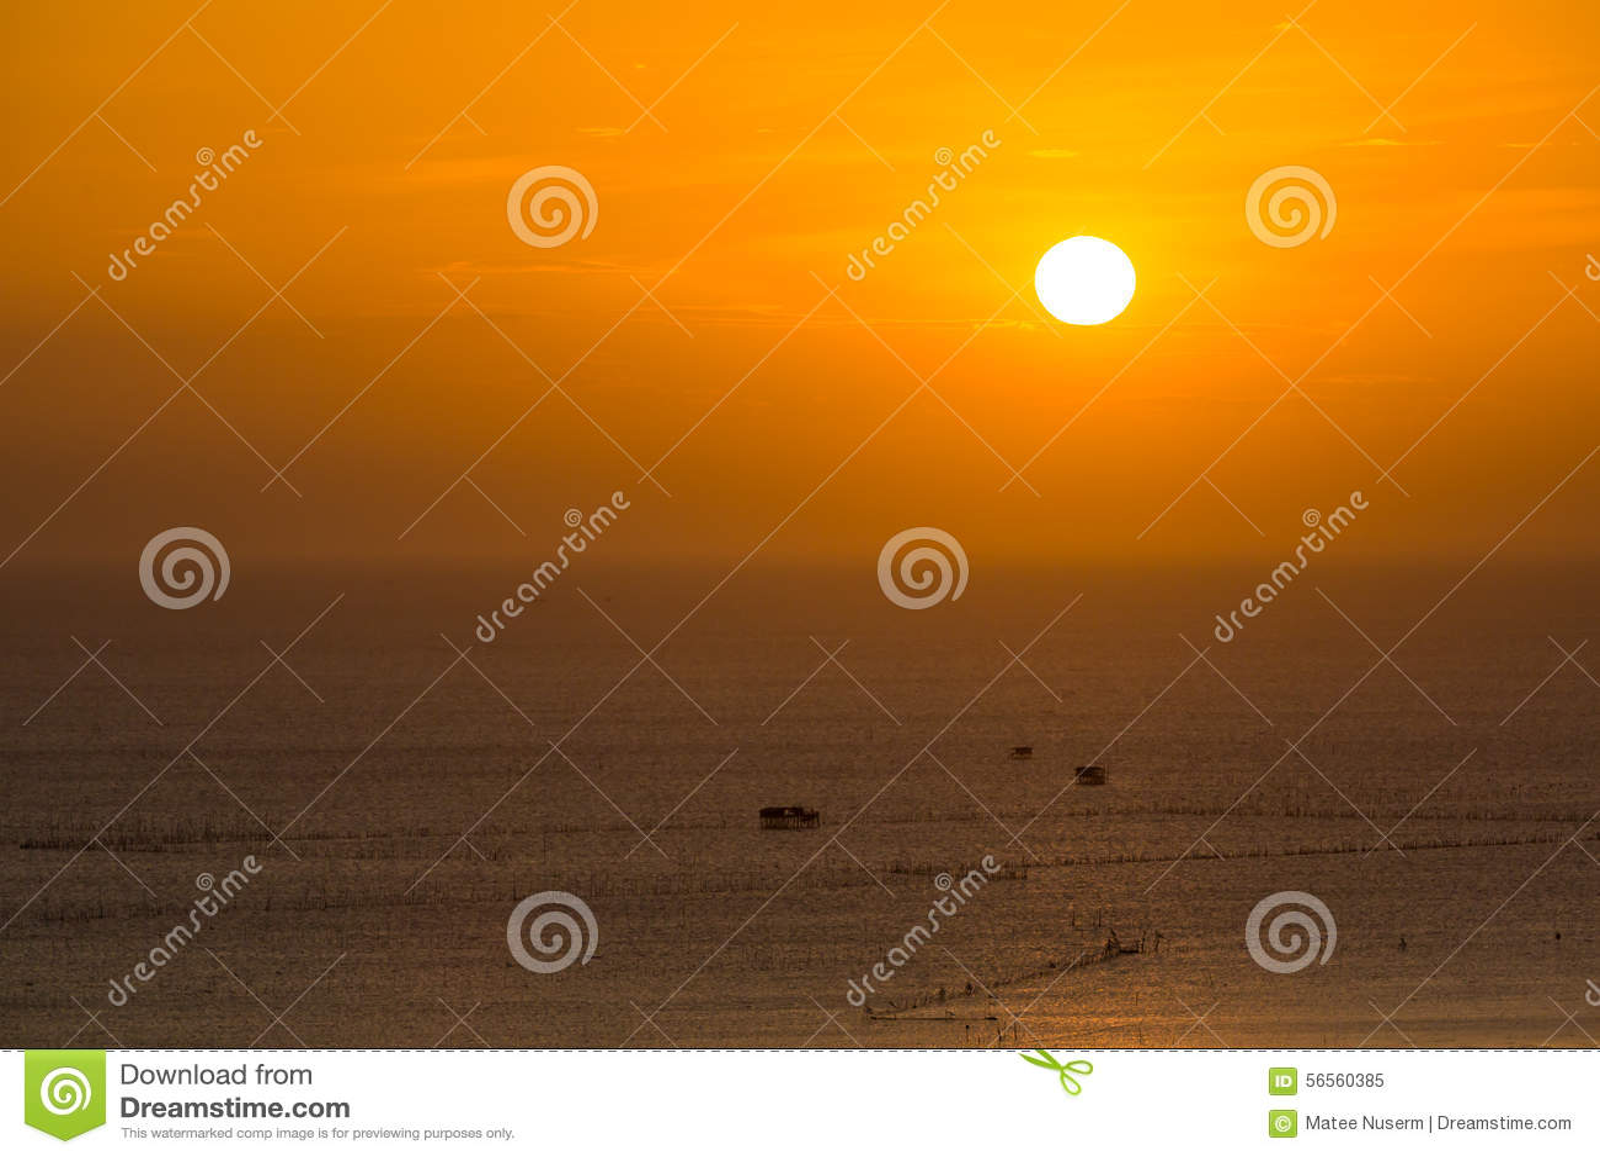 Download όμορφο ηλιοβασίλεμα ουρανού Στοκ Εικόνα - εικόνα από ουρανός, ωκεανός: 56560385